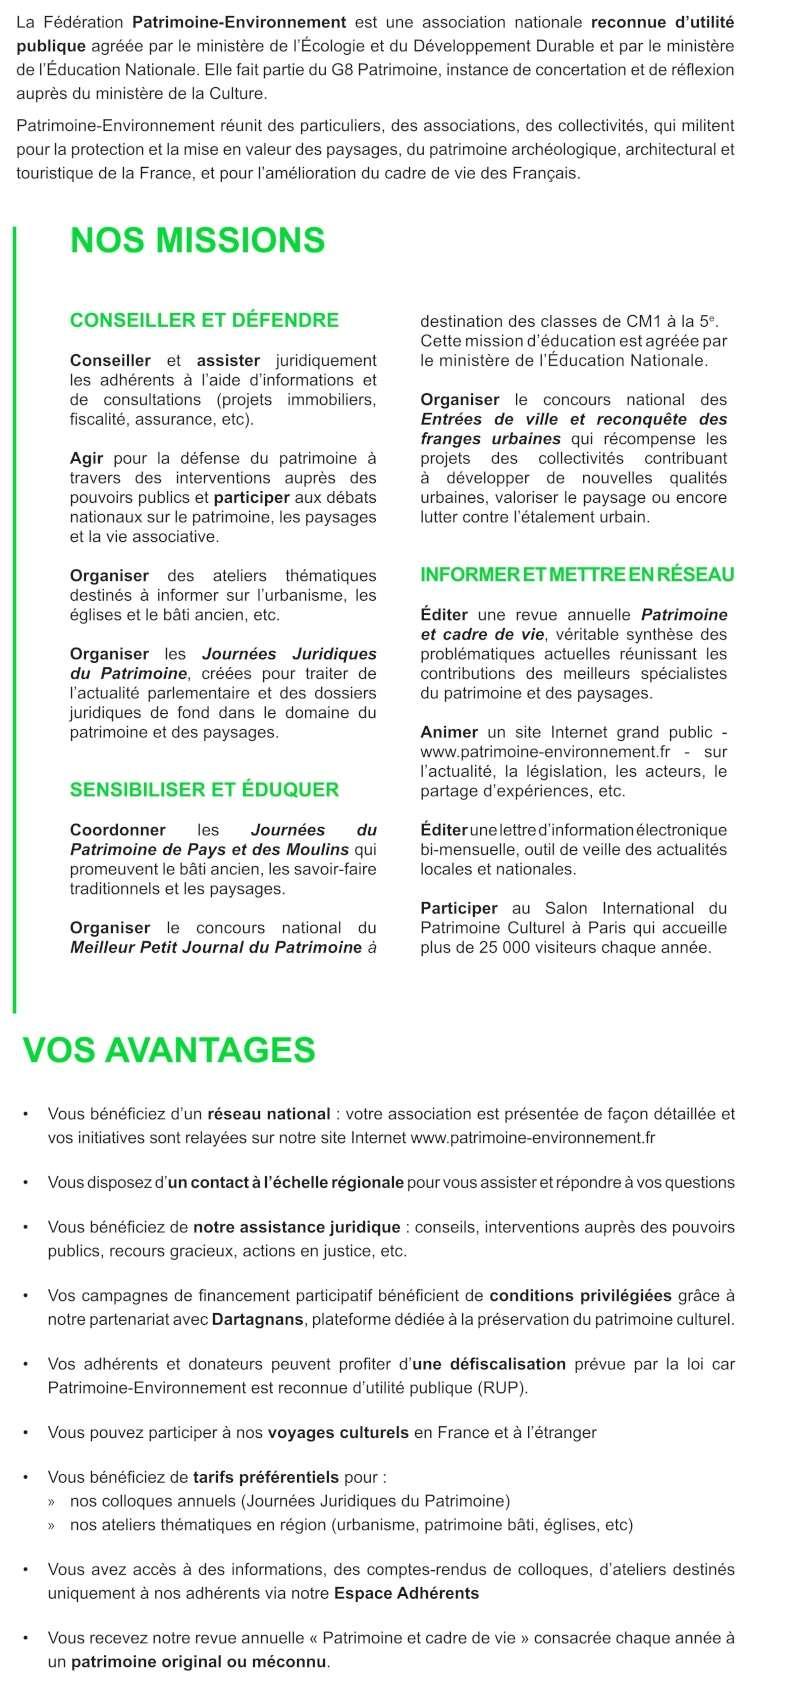 Patrimoine et Environment Avanta10